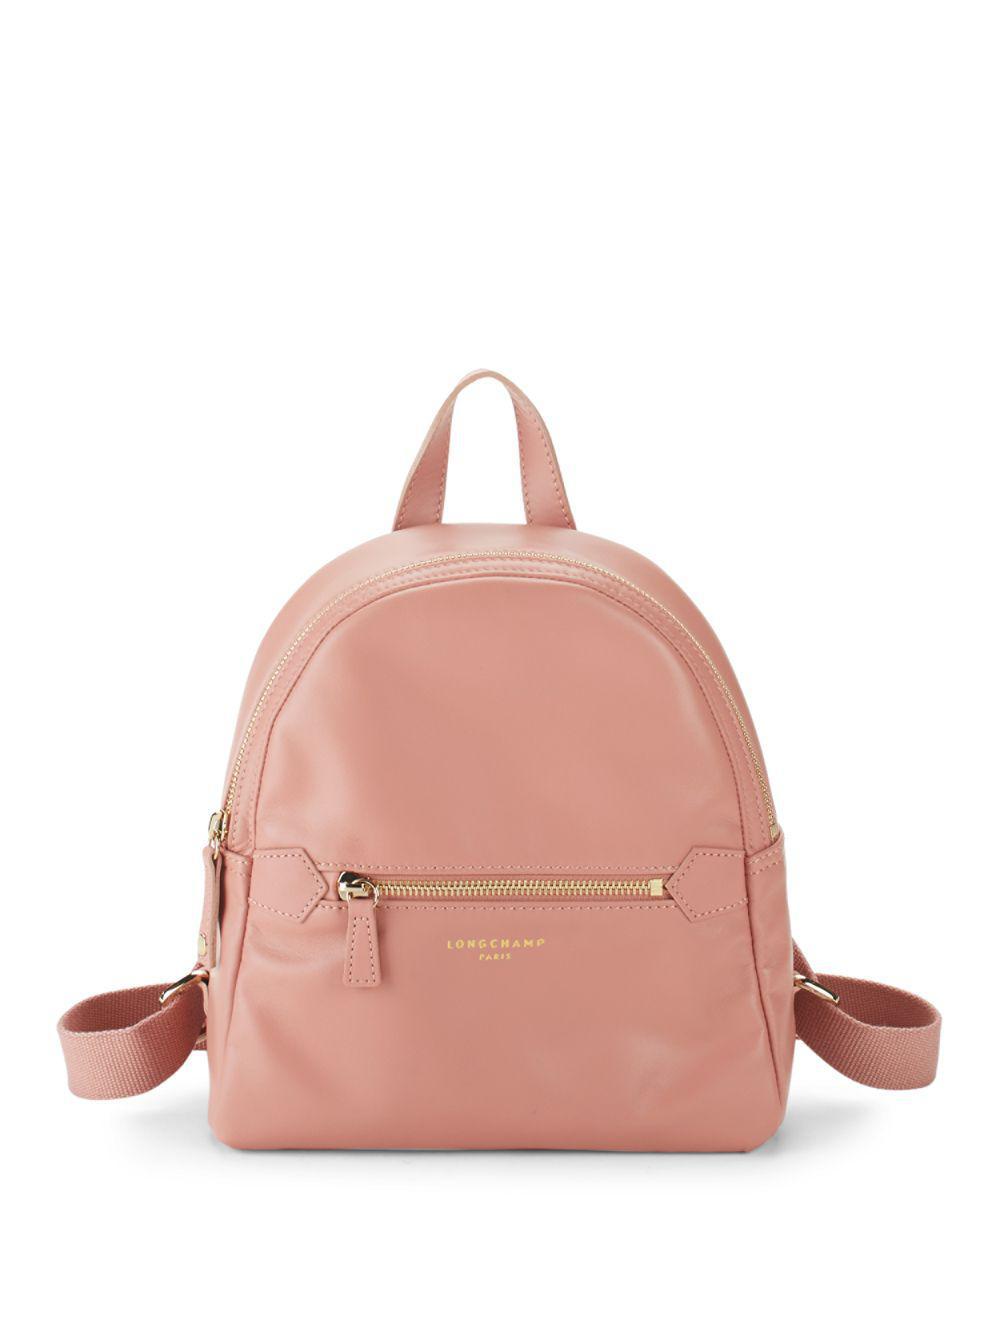 b35a32a7461e Longchamp - Pink Leather Backpack - Lyst. View fullscreen